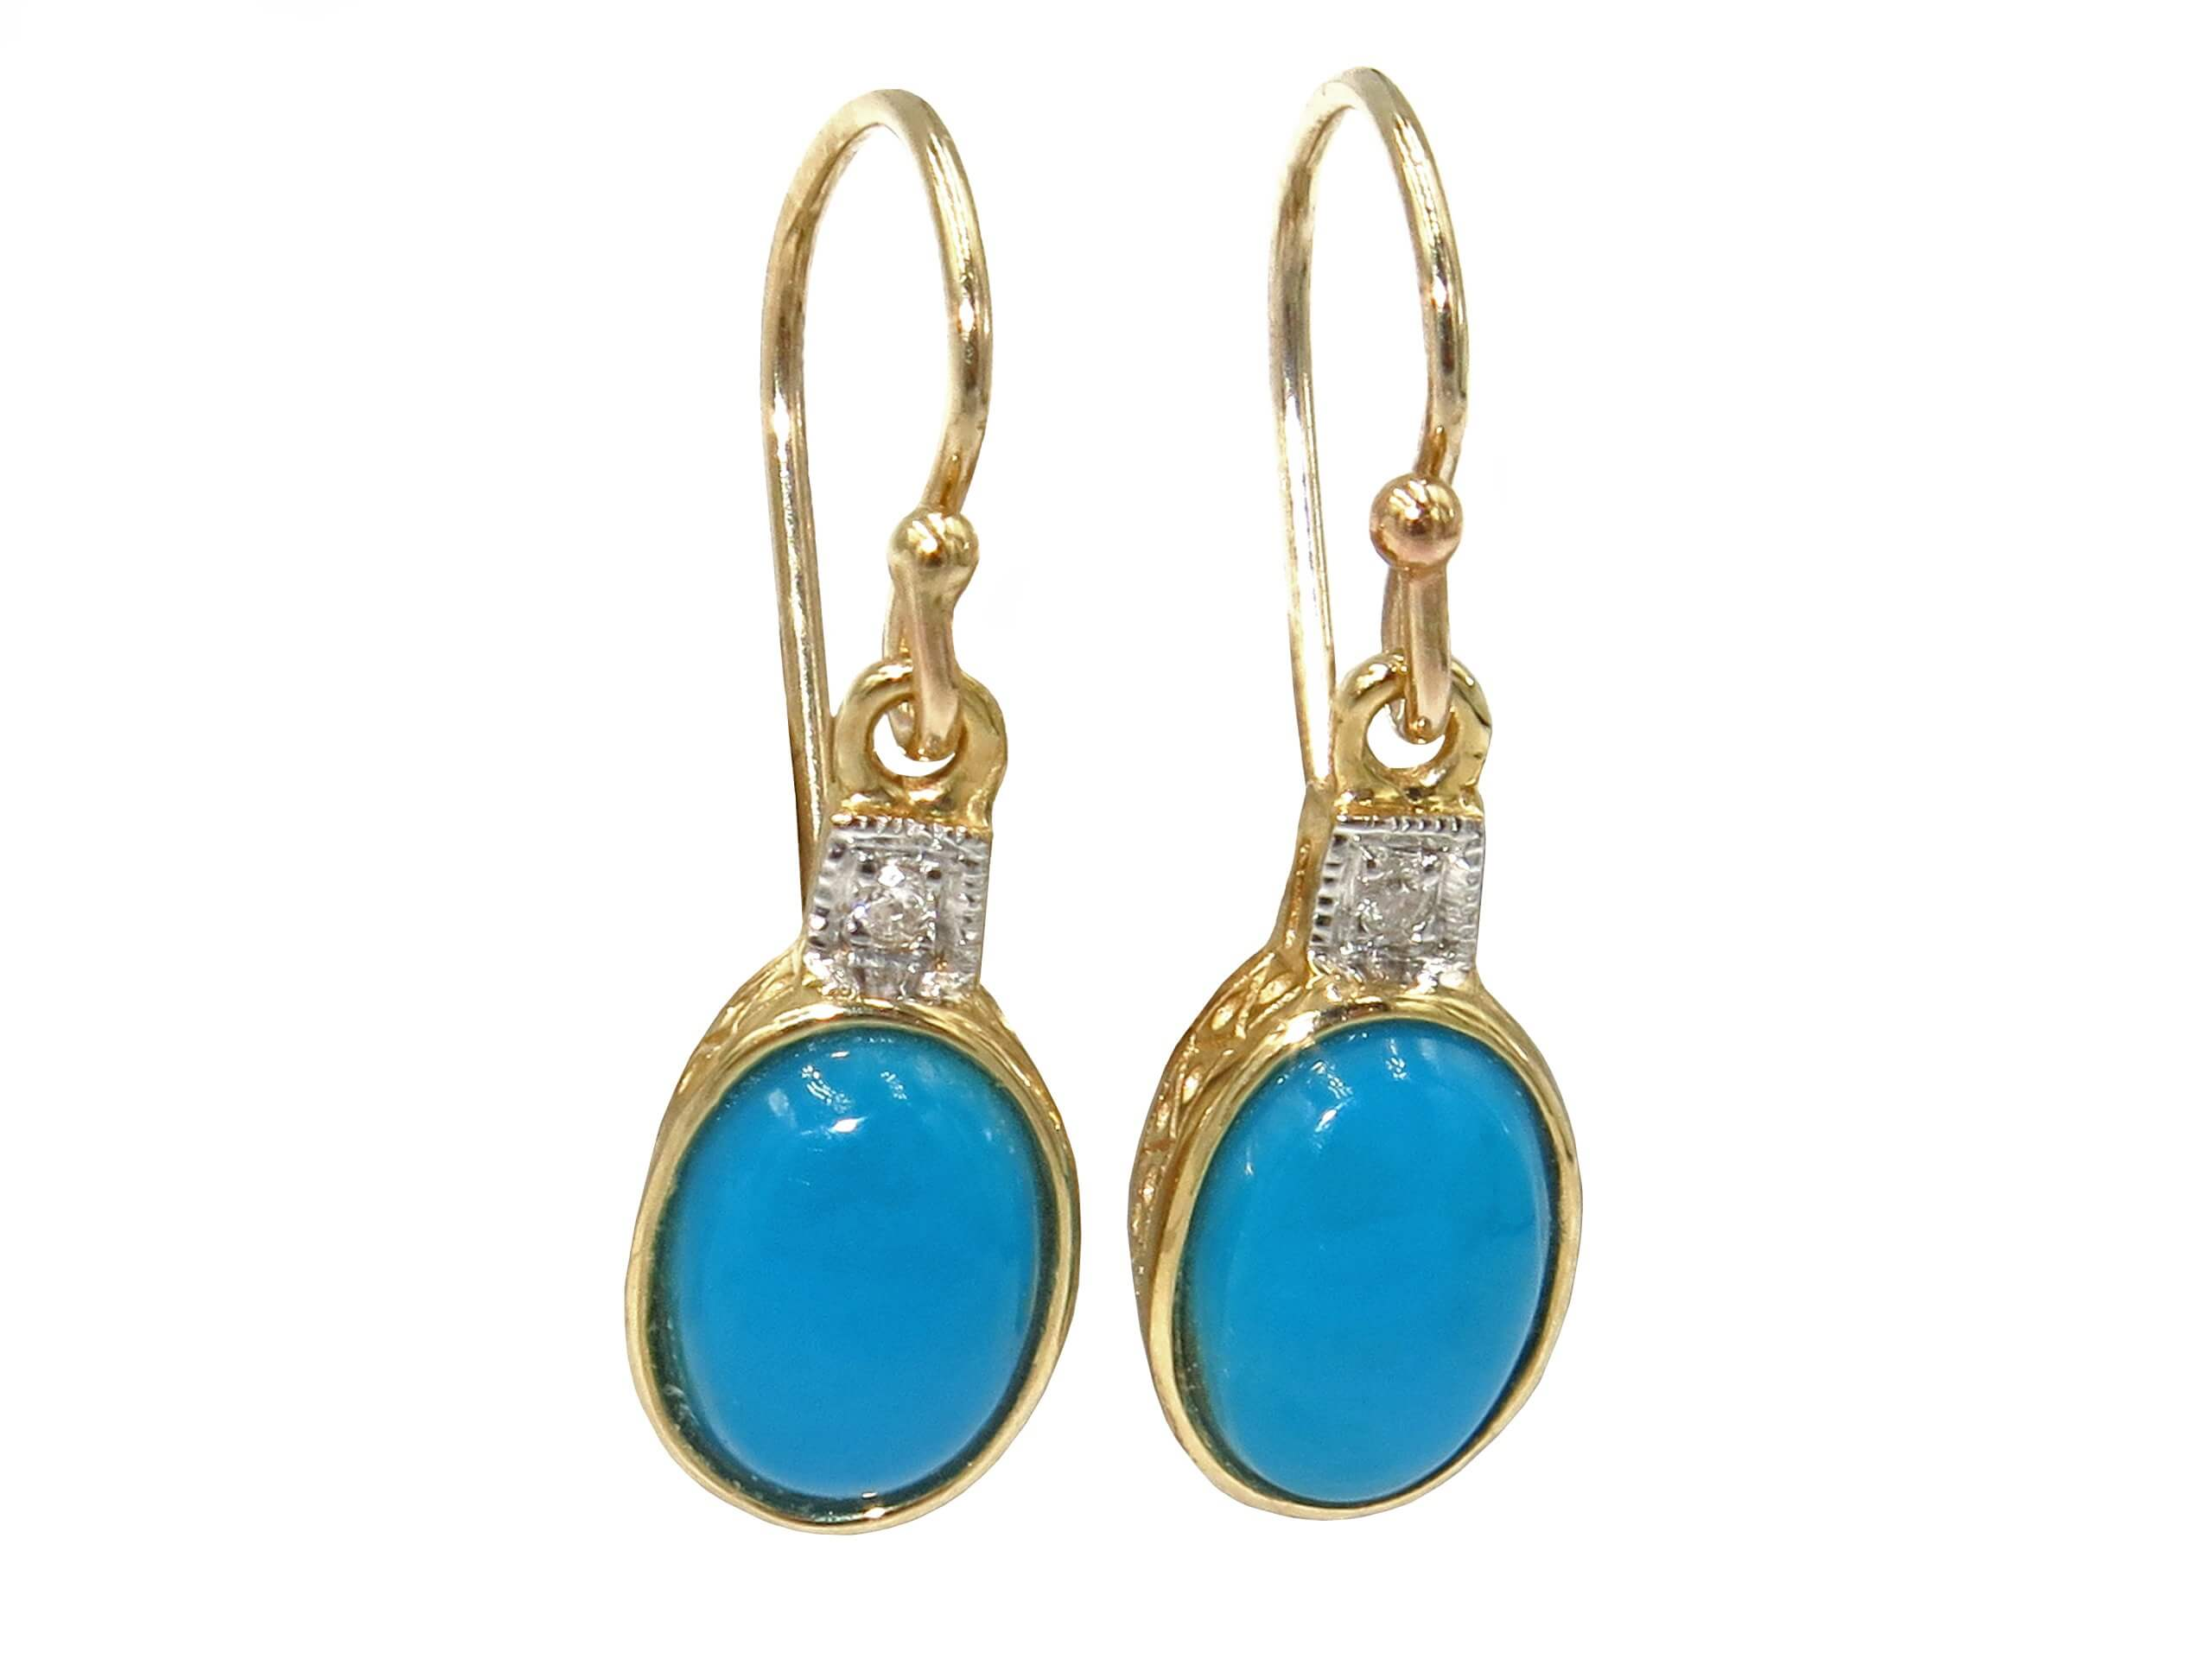 TURQUOISE AND DIAMOND EARRINGS MJ24416